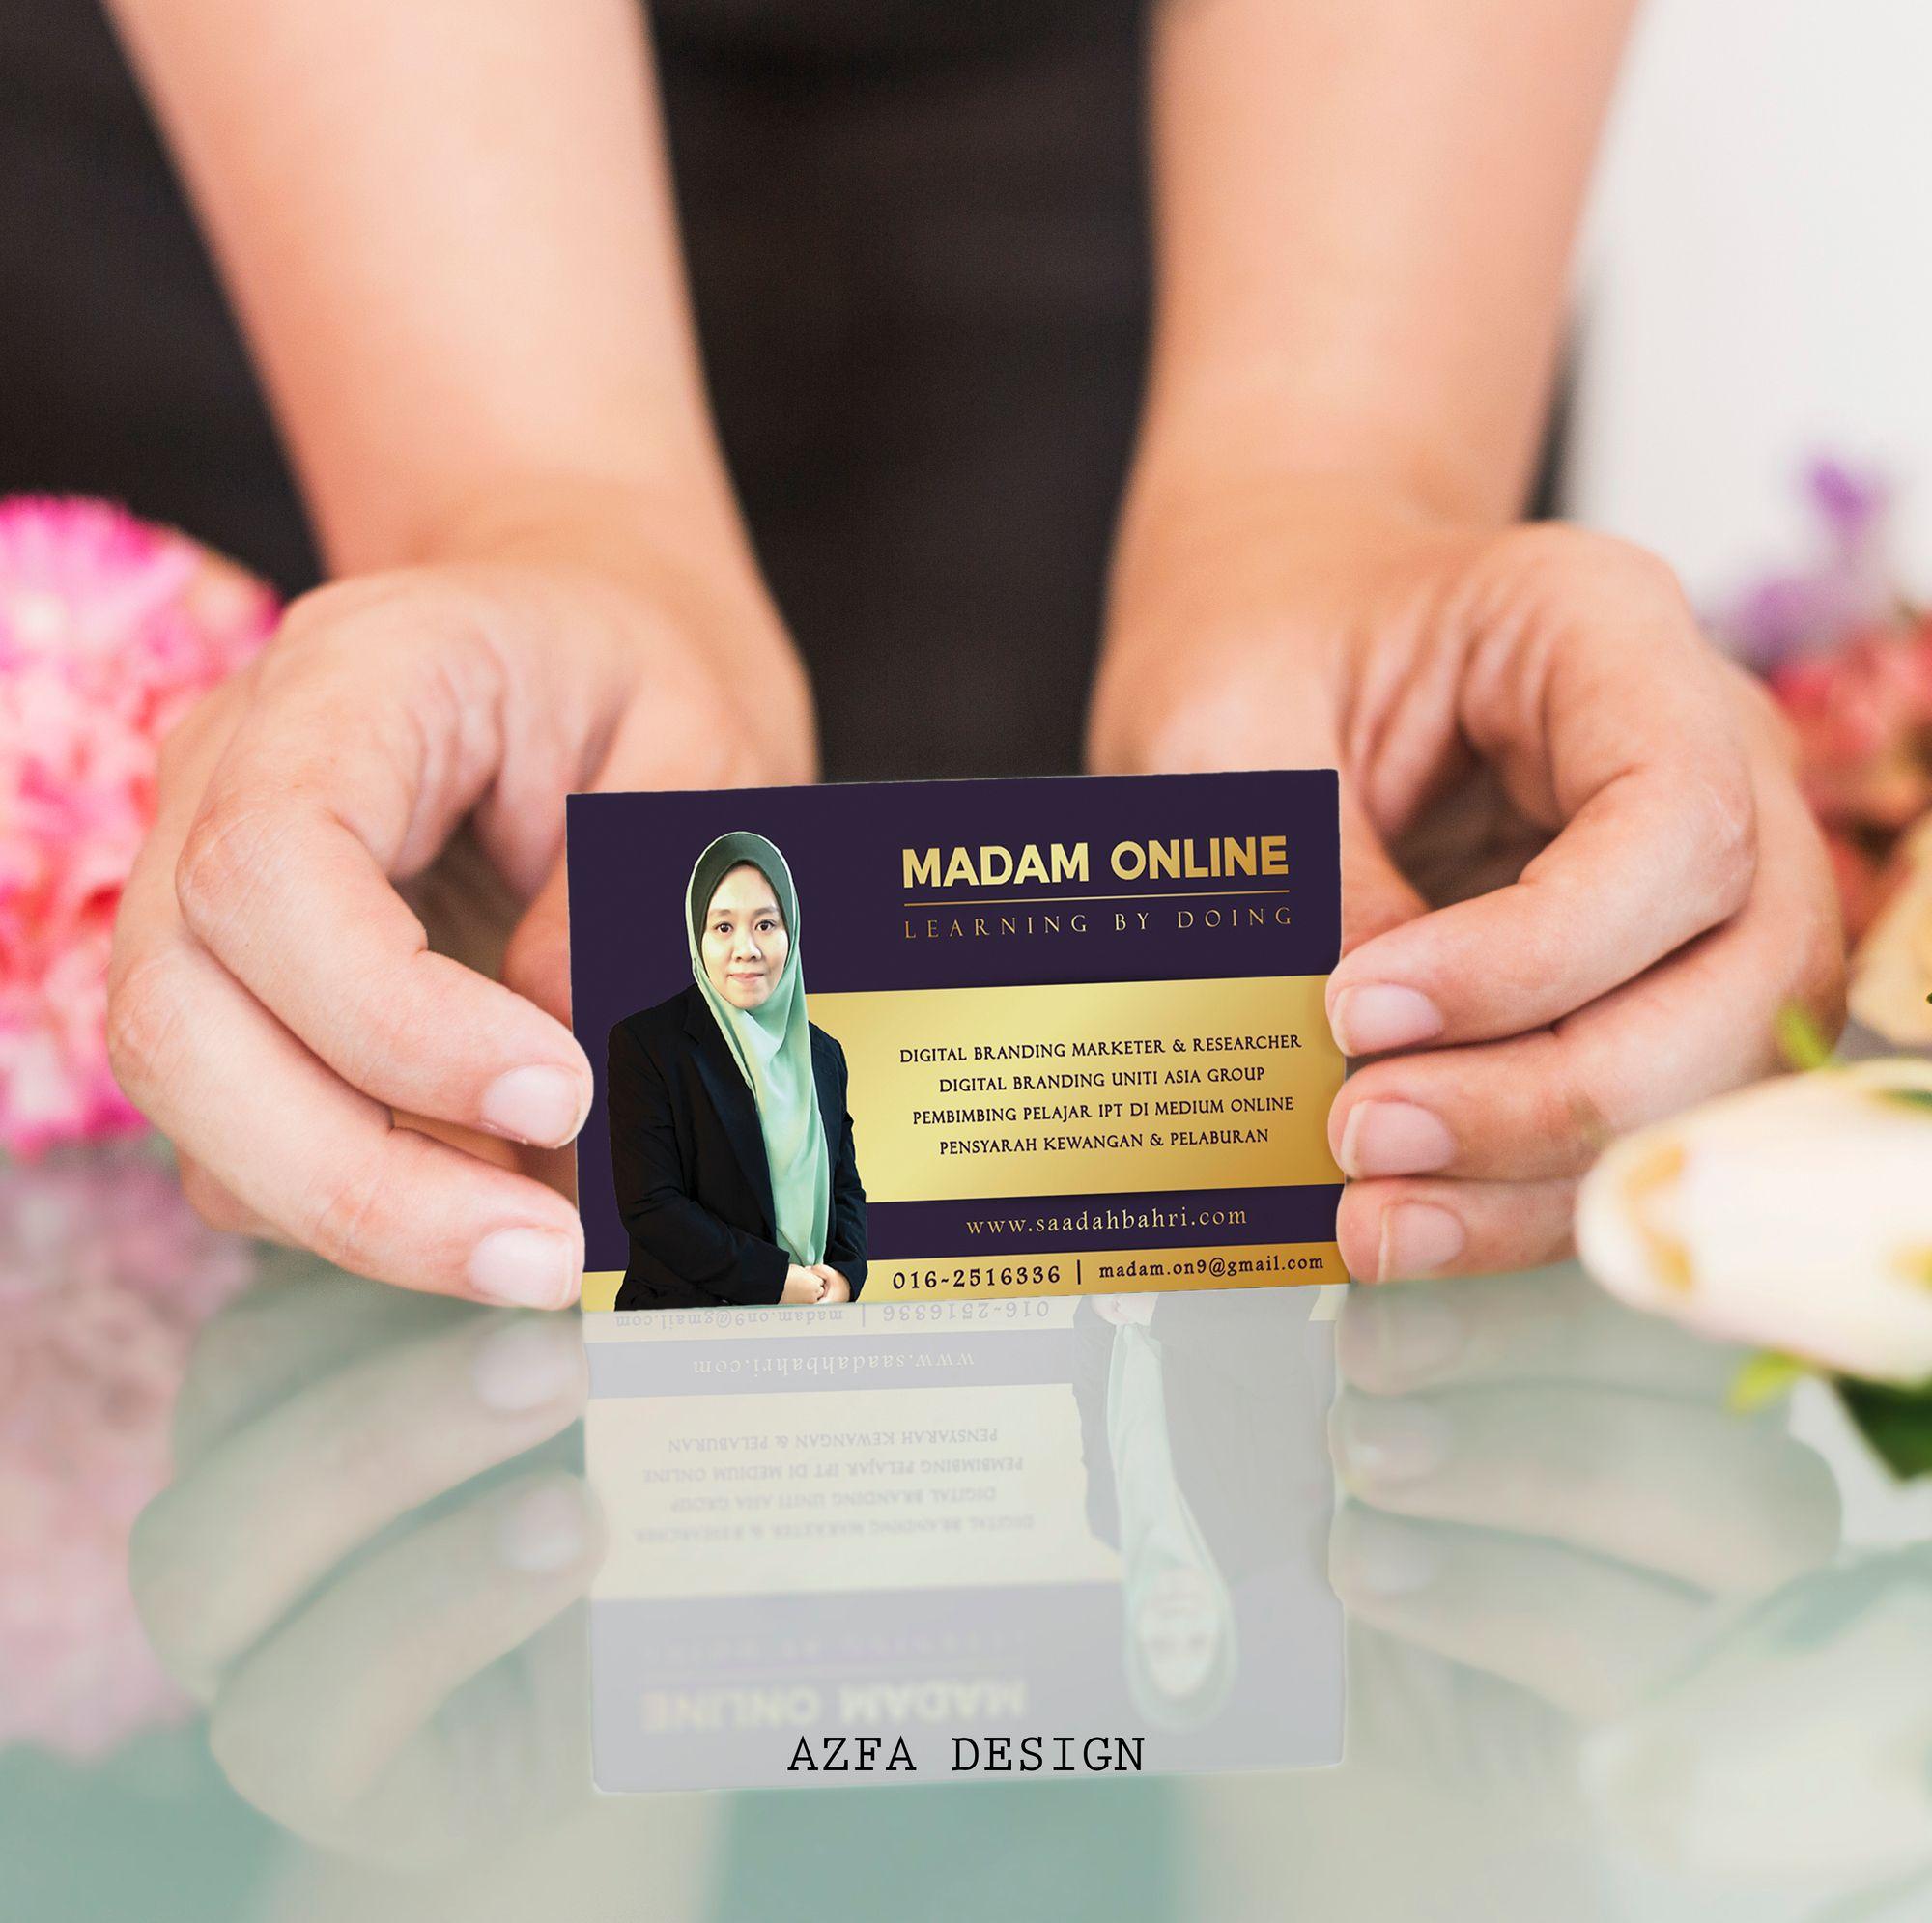 Businesscard Boleh Bagi Bisnes Kad Belum Ada Lagi Kenapa Perlu Ada Ha Name Cards Cards Whatsapp Message